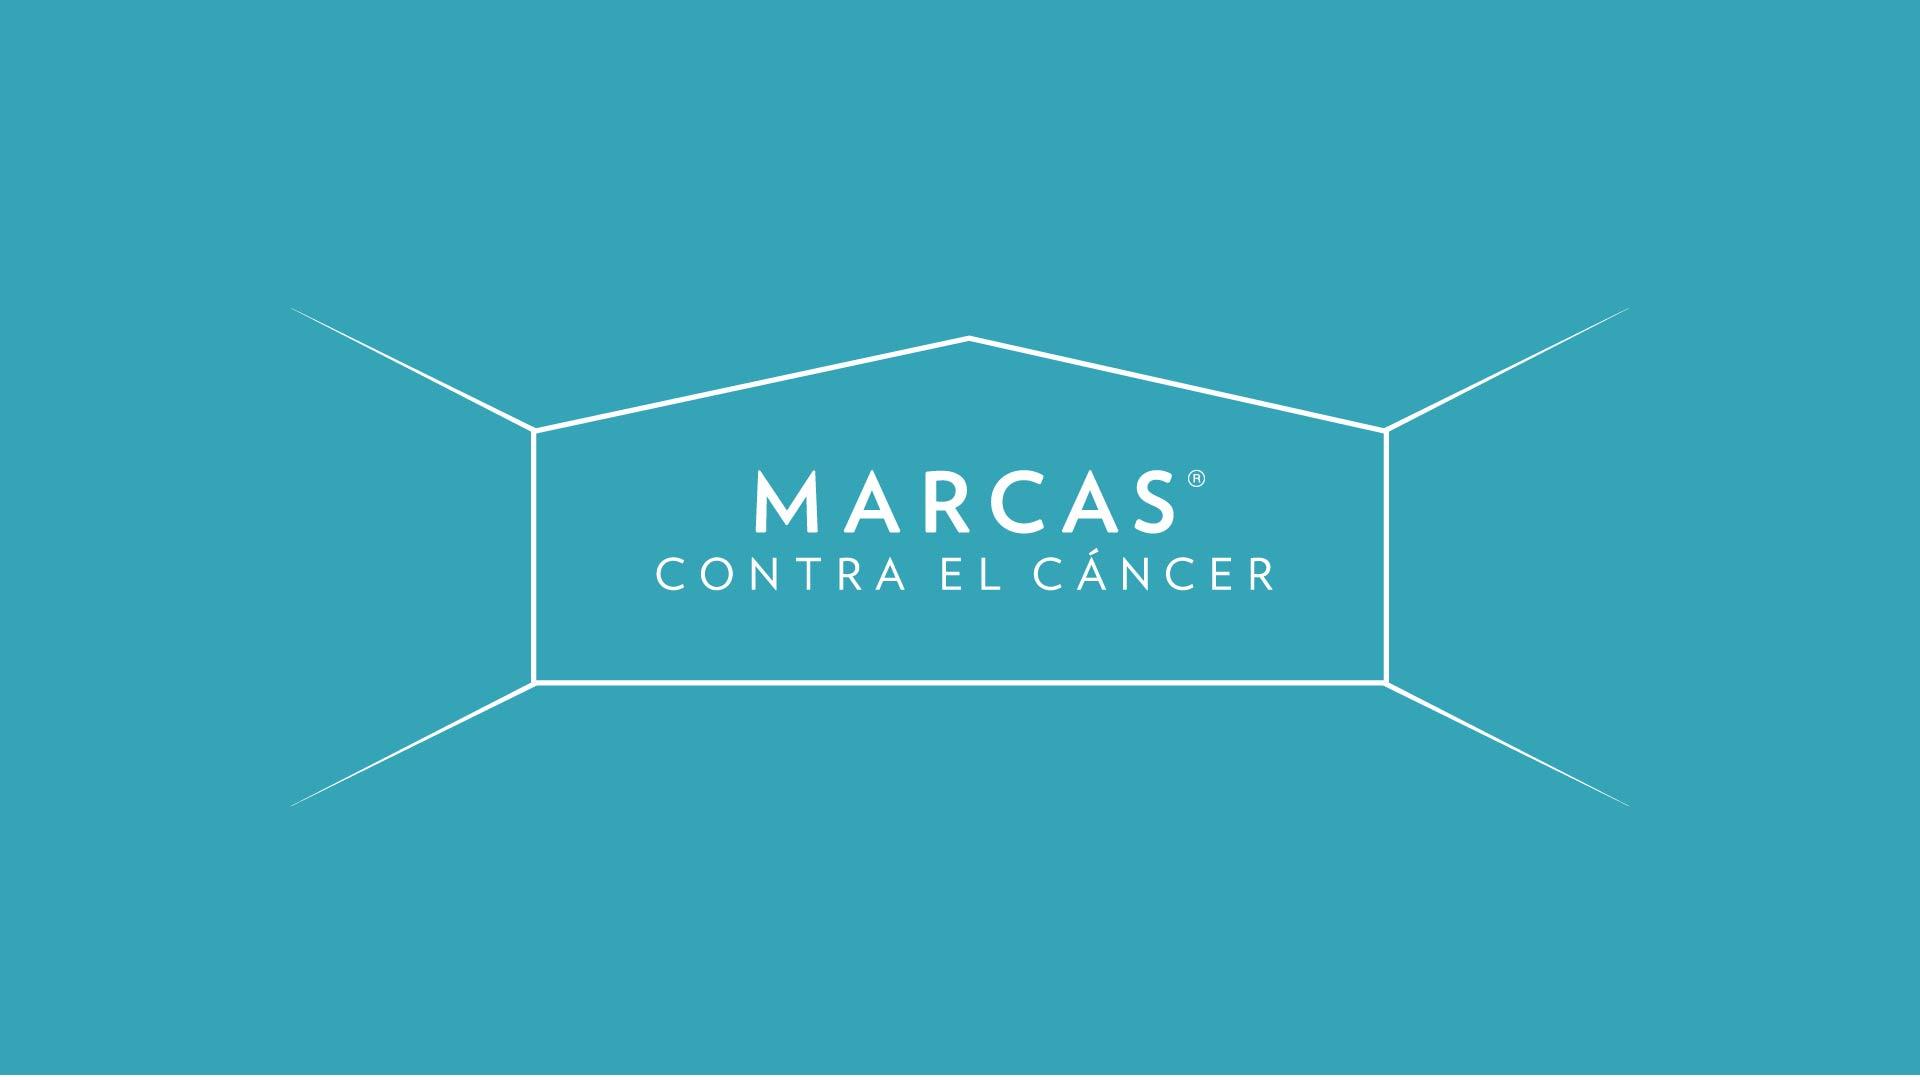 marcascontraelcancer_logo-marca-registrada